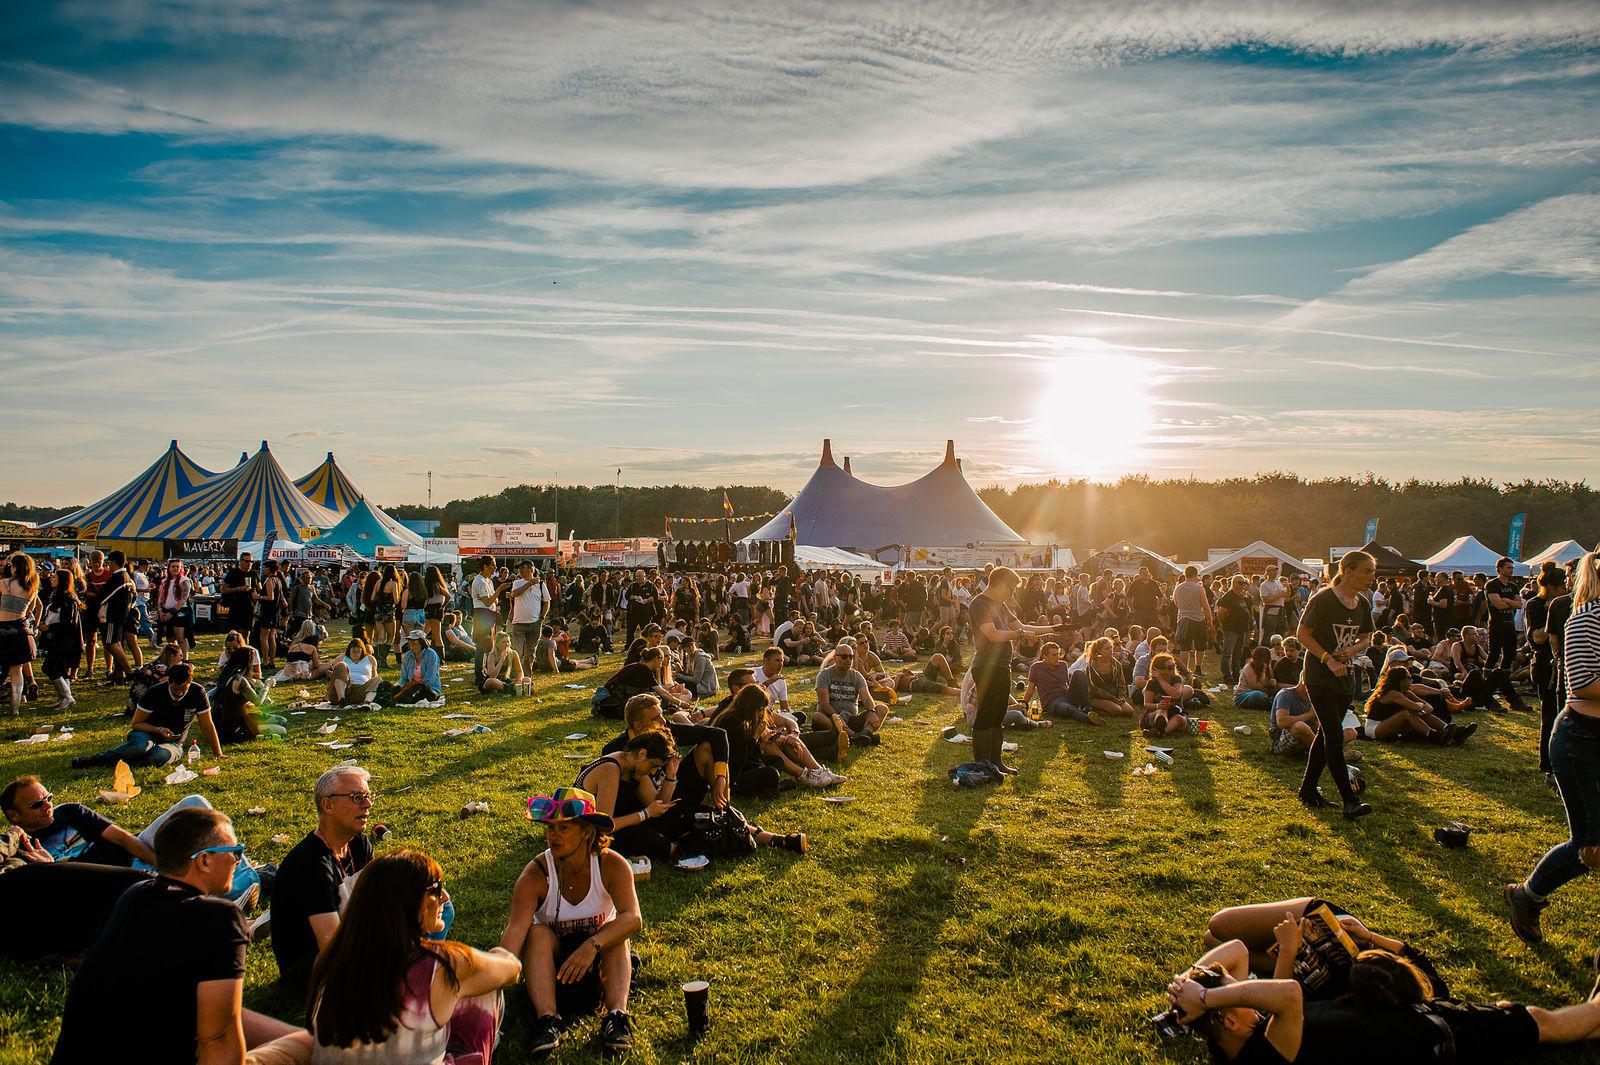 Crowds enjoying sunset at festival